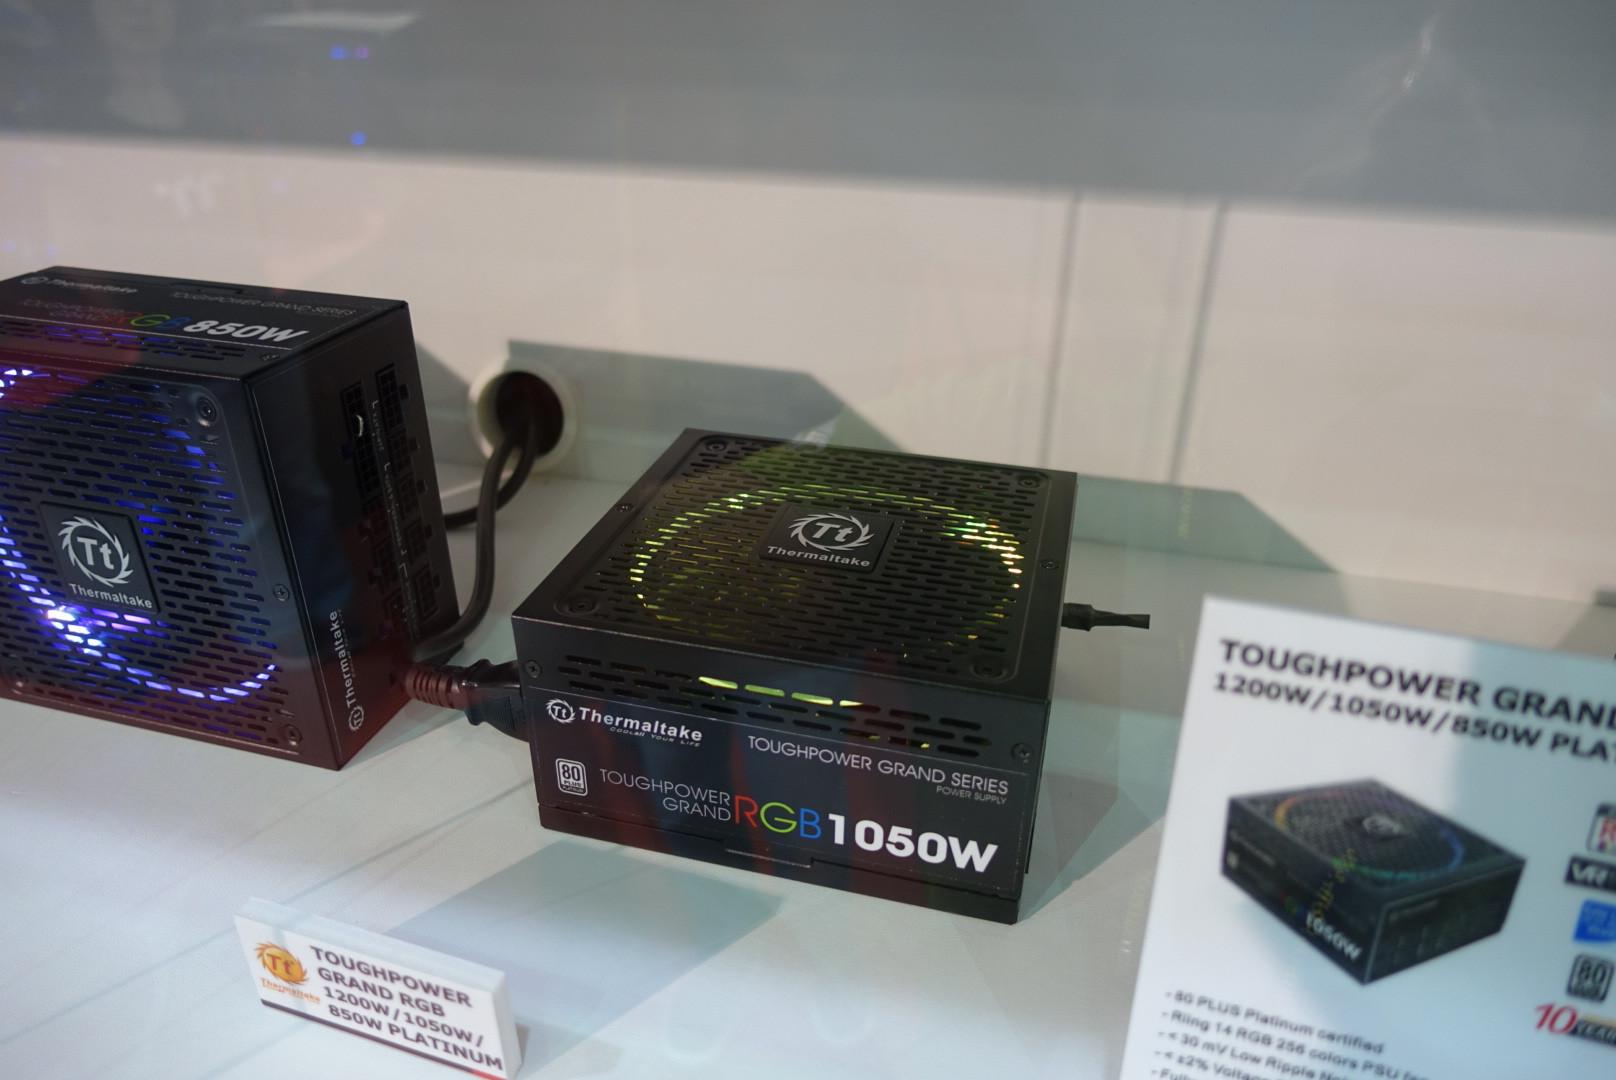 Thermaltake Touchpower Grand RGB